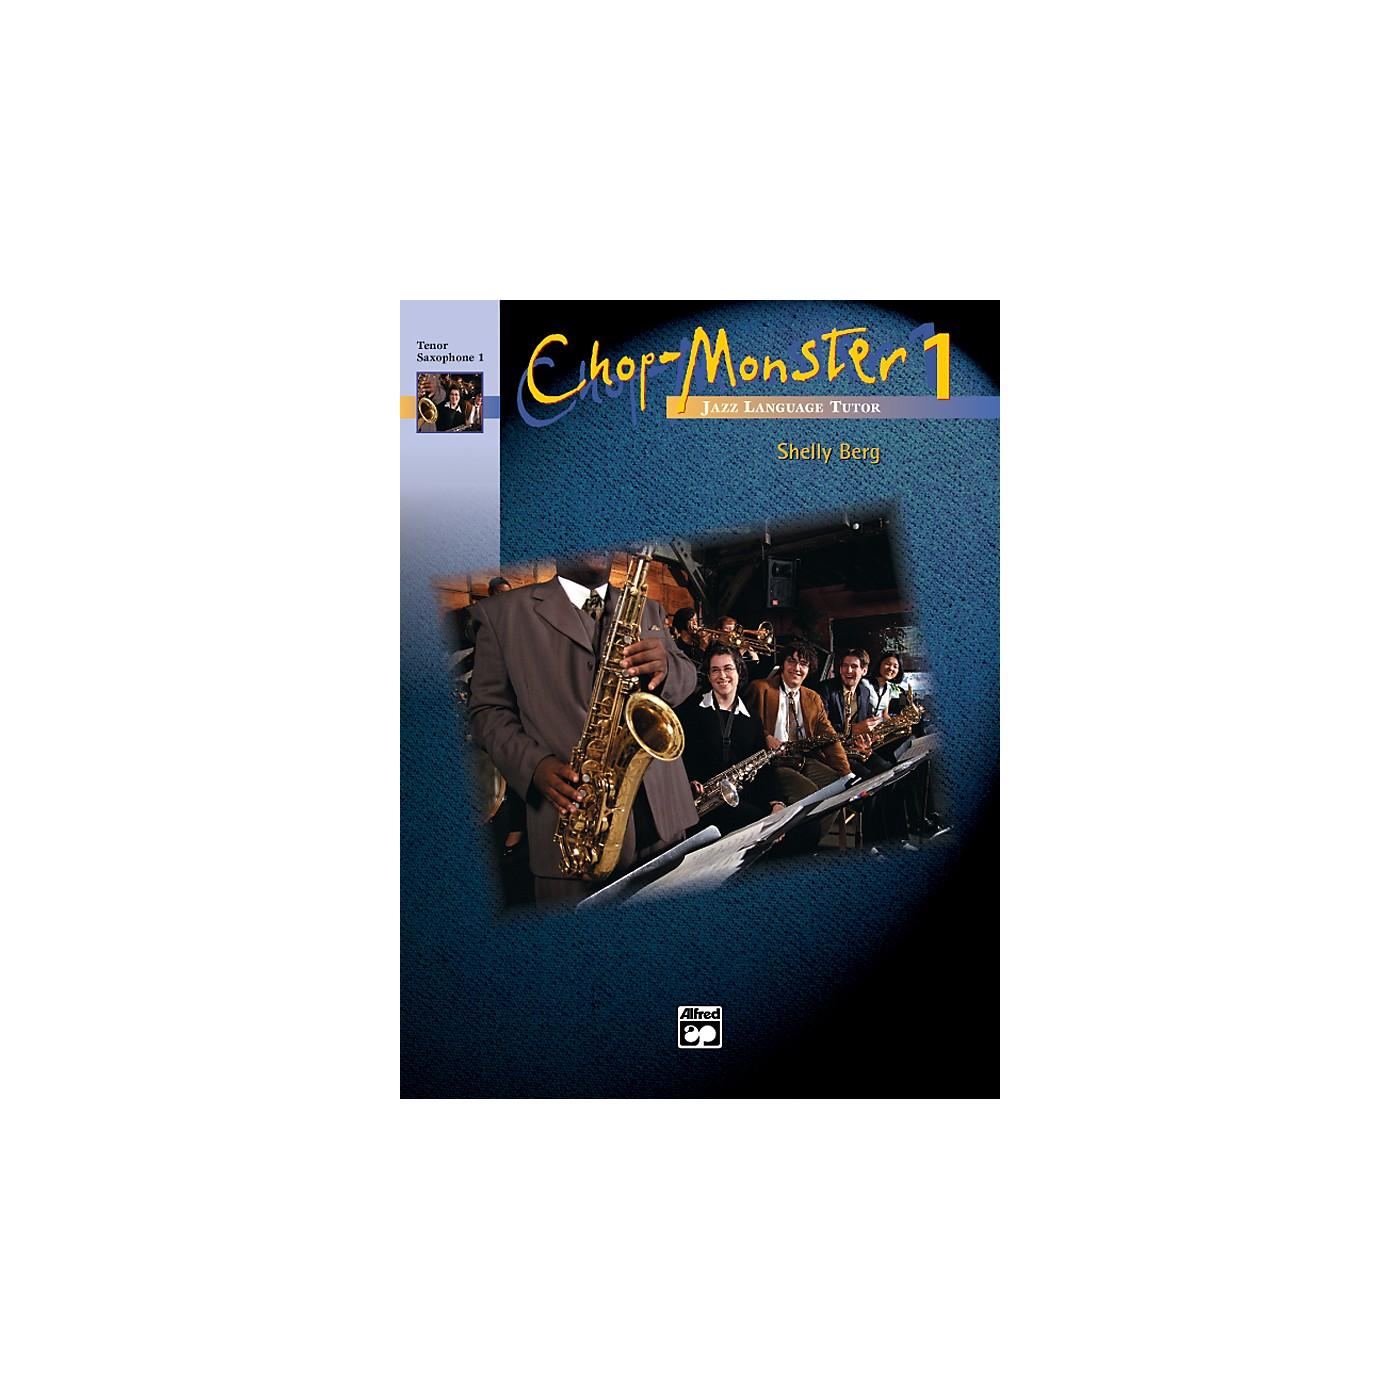 Alfred Chop-Monster Book 1 Alto Saxophone 2 Book thumbnail